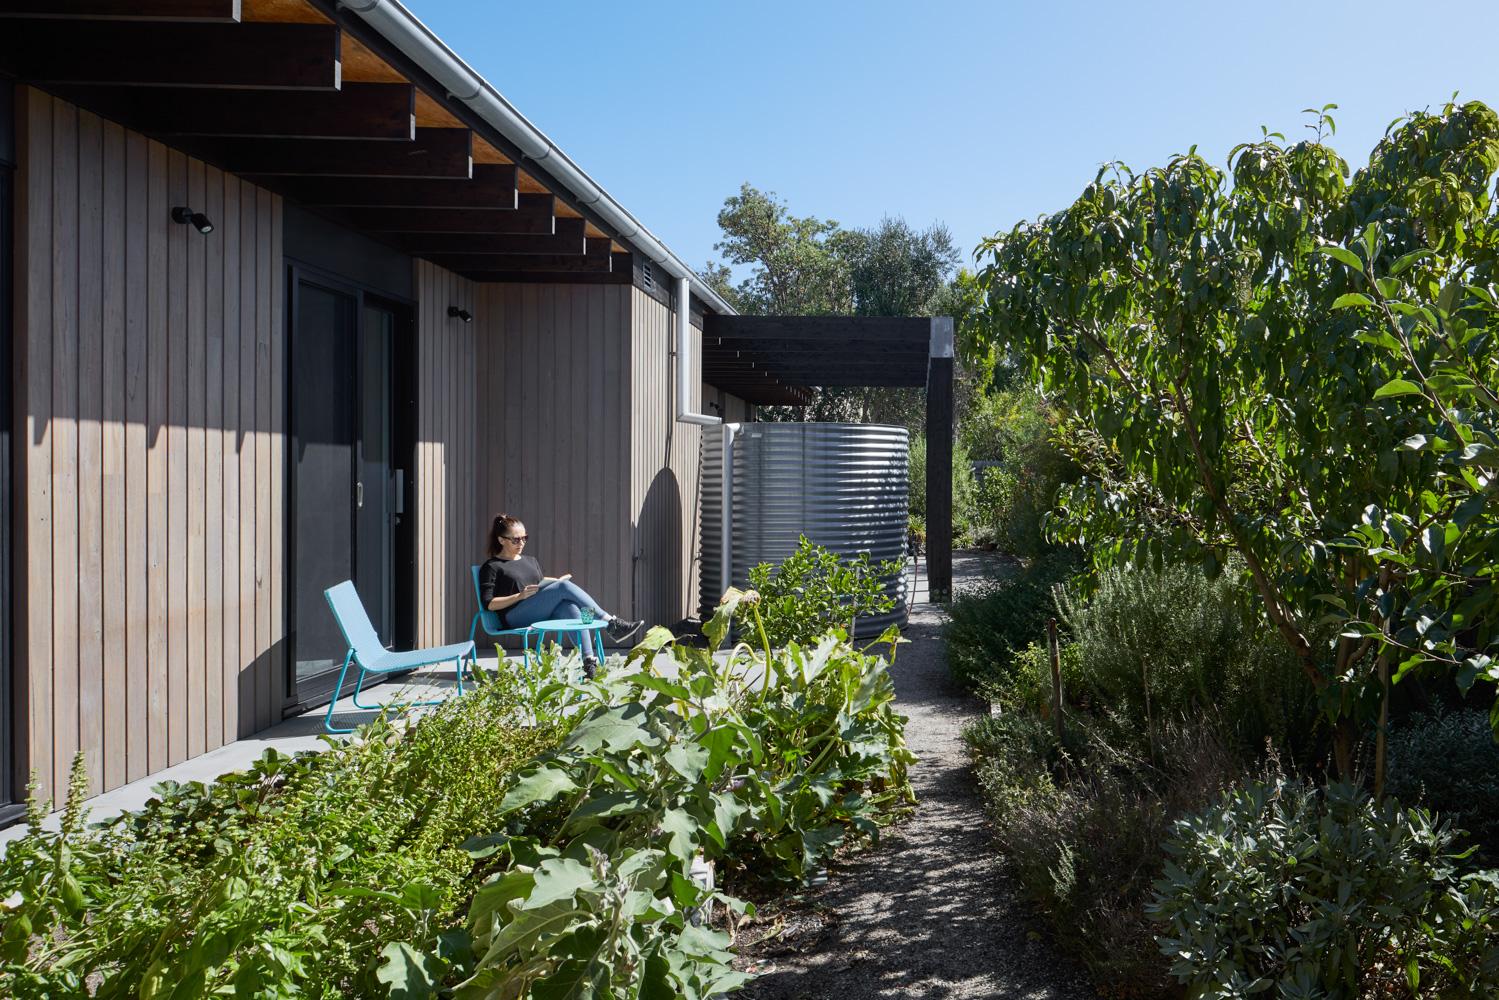 Landscape idea for home